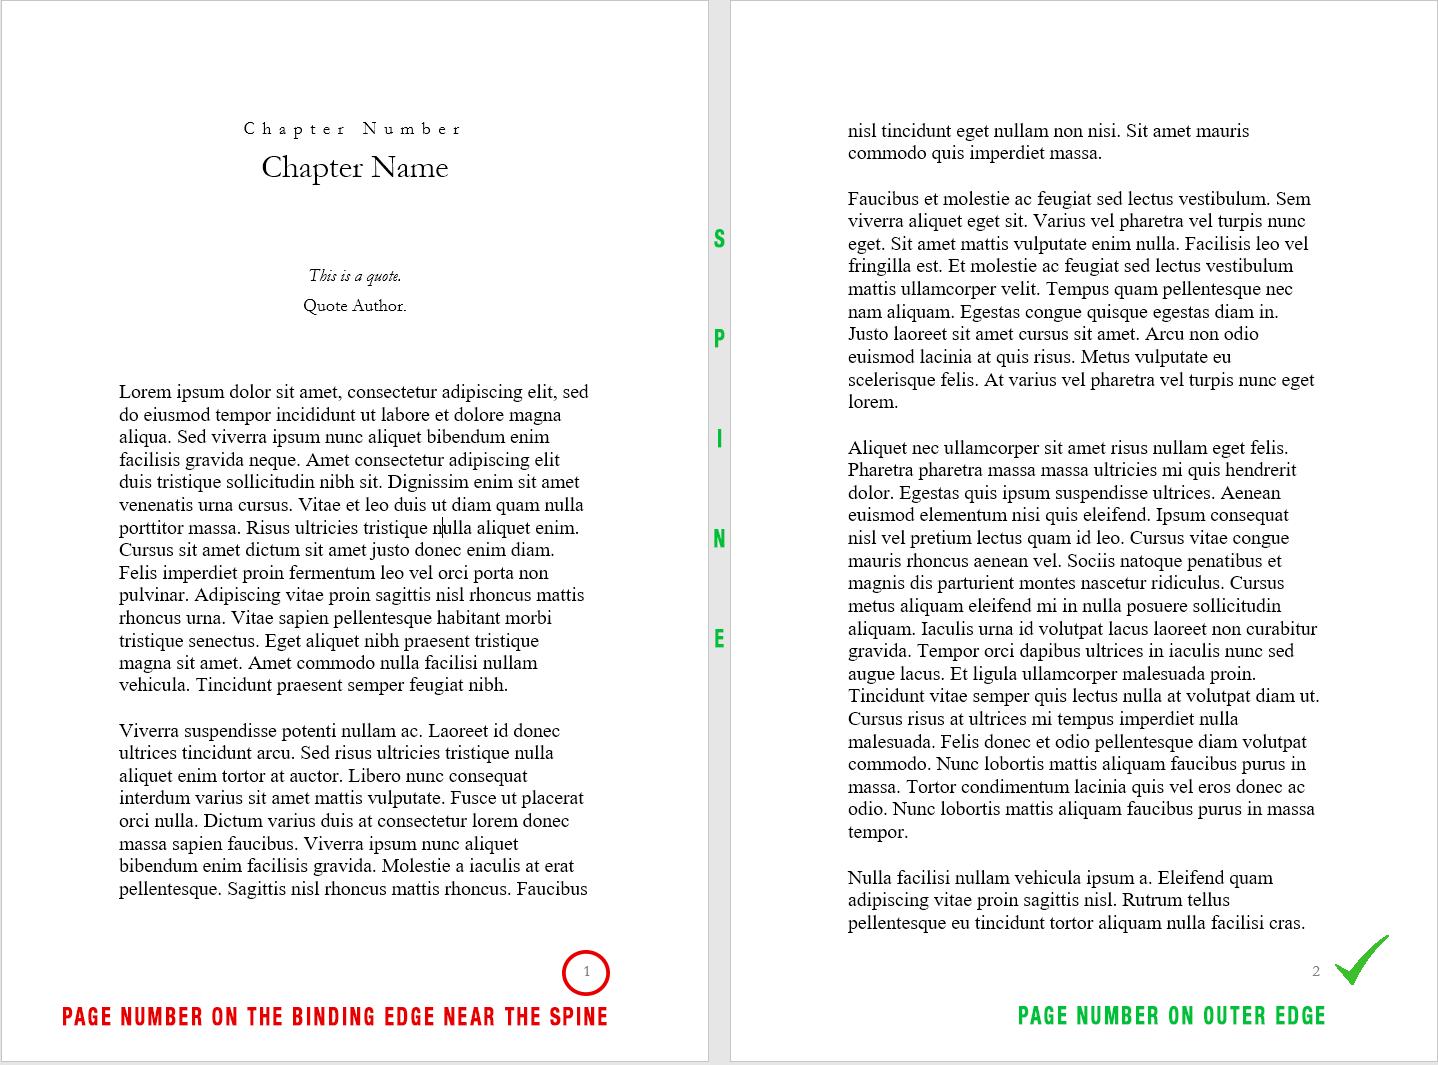 book printing page numbers 1